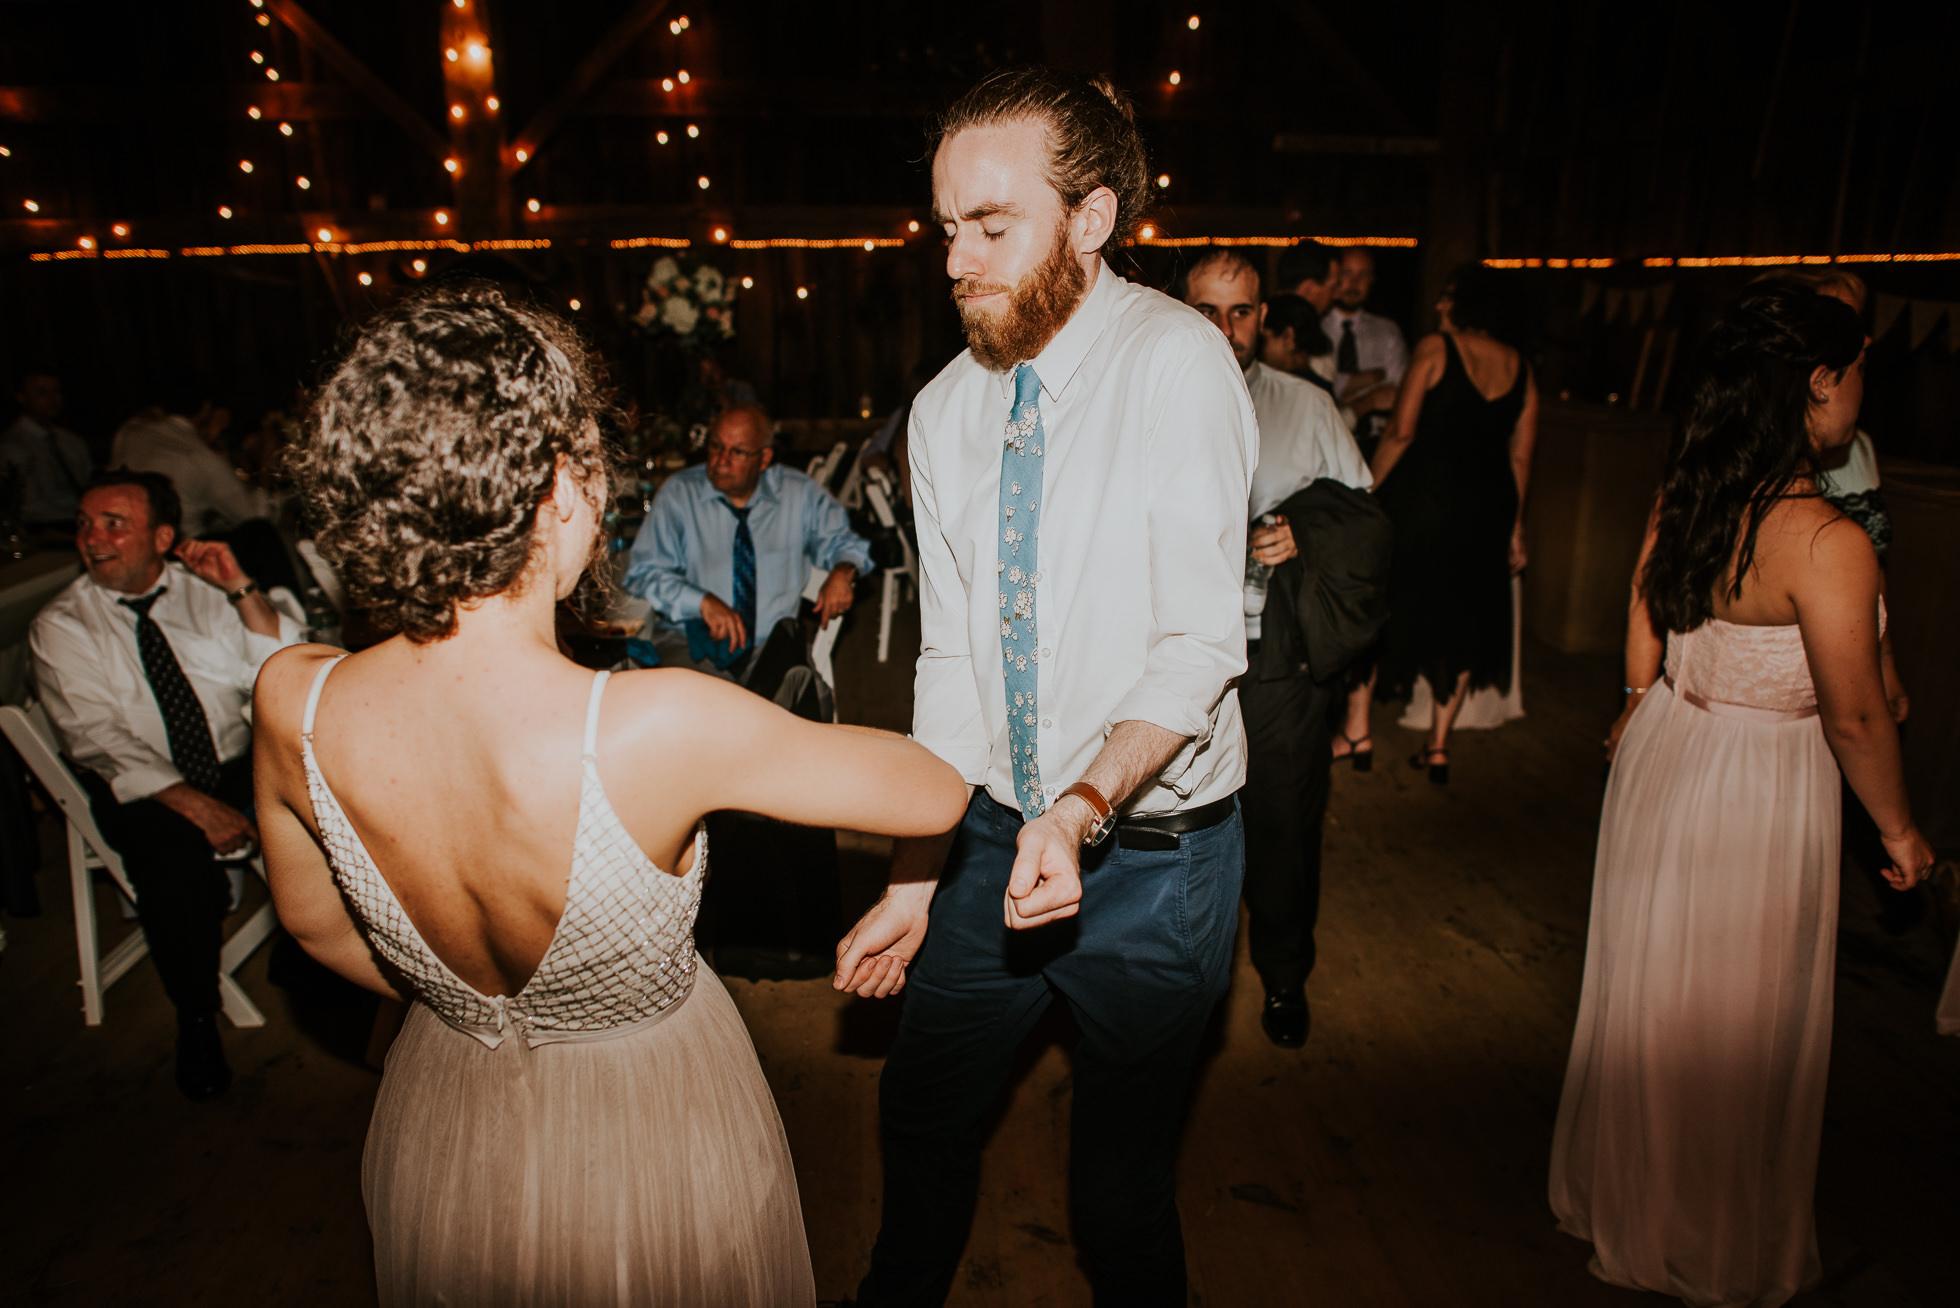 dancing photos wedding long island